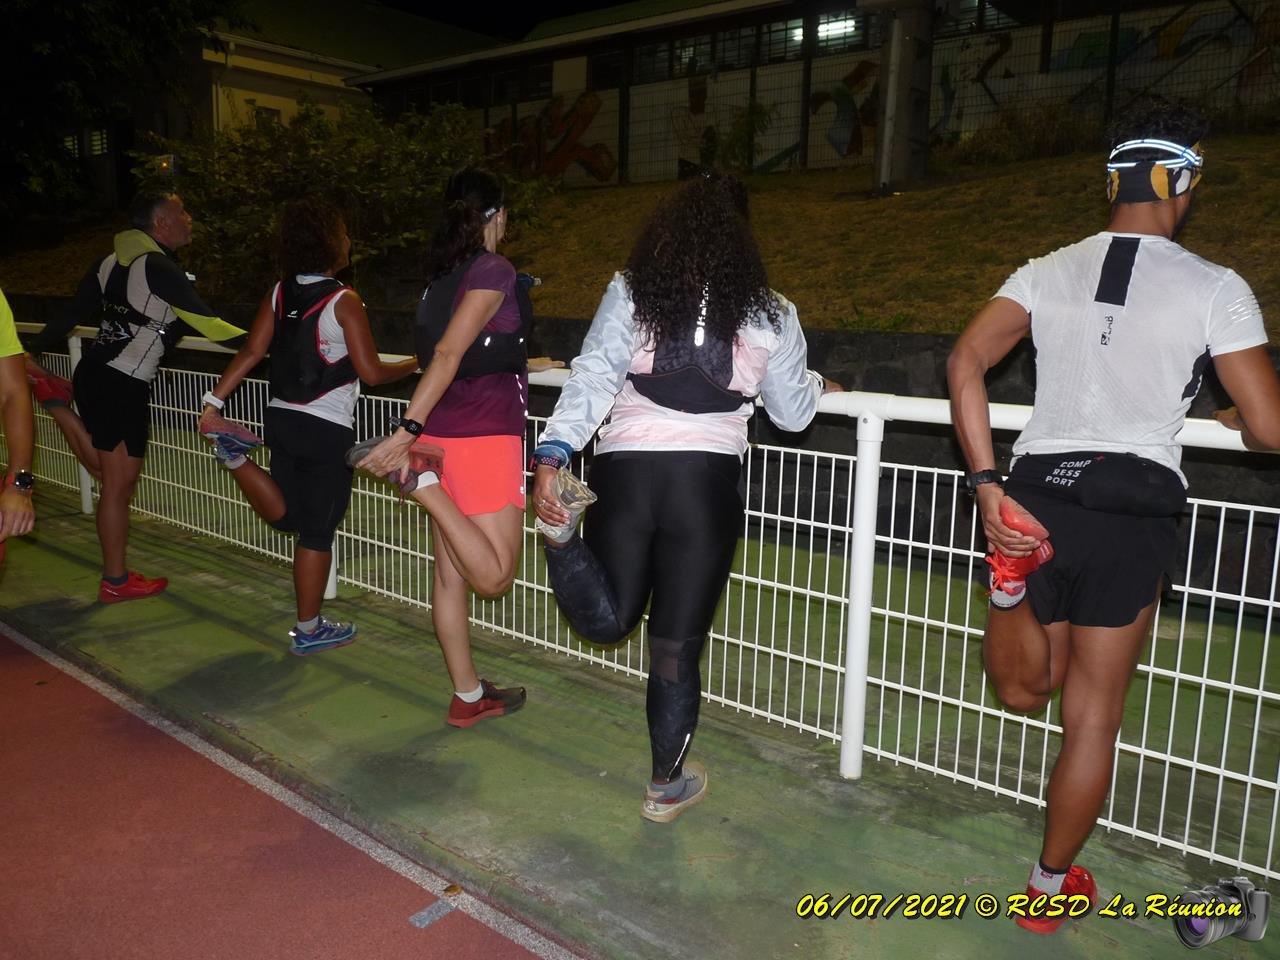 20210706 Entrain Trail Trinité 058